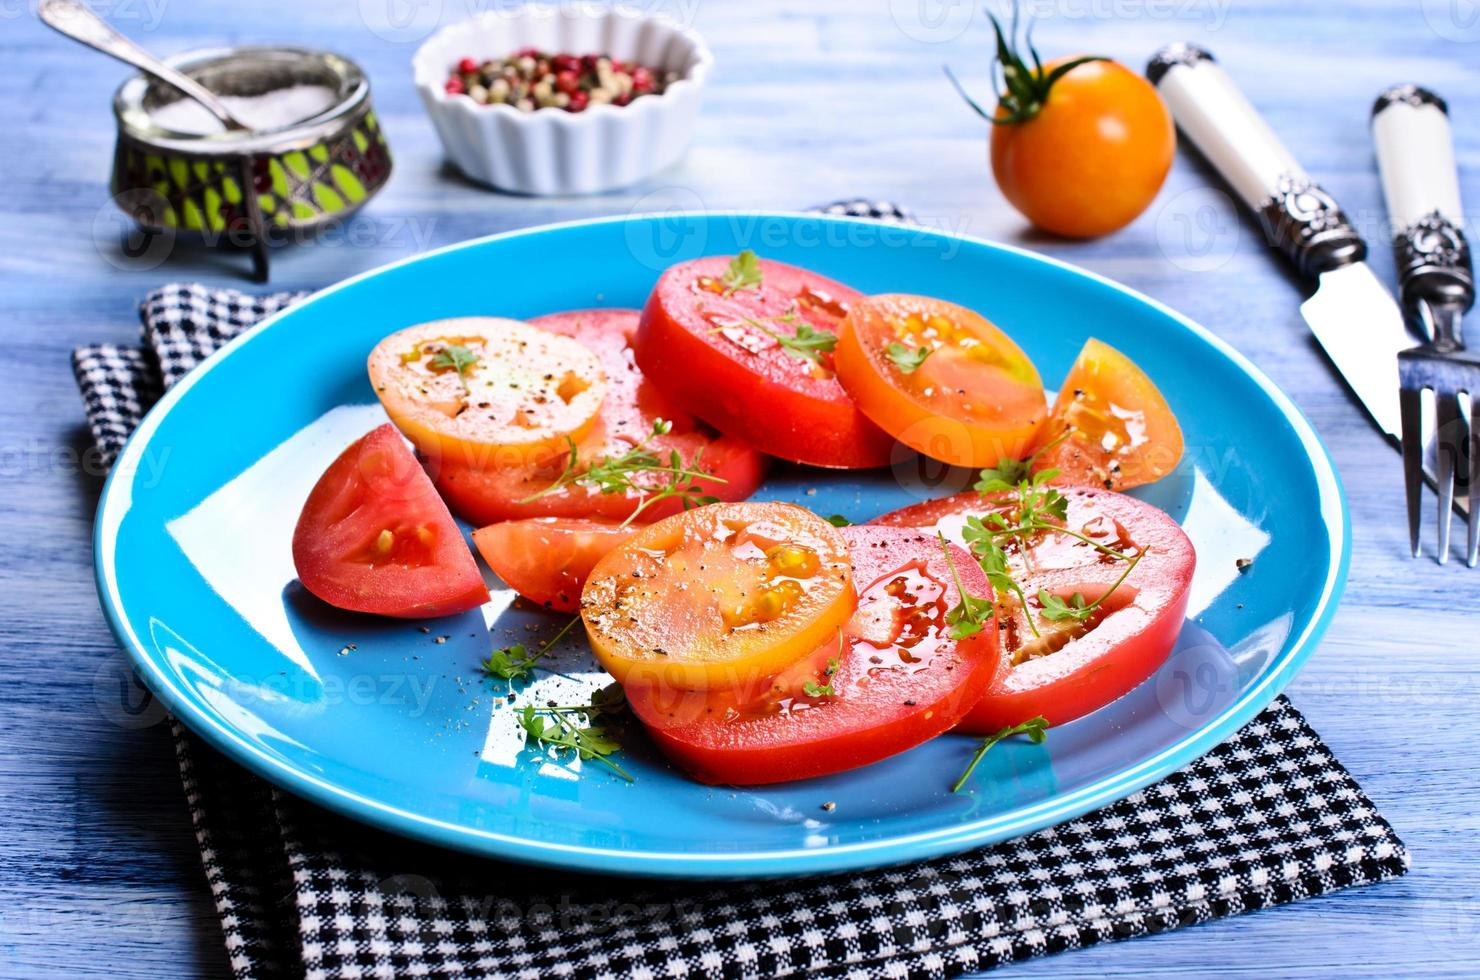 Salad of tomatoes photo